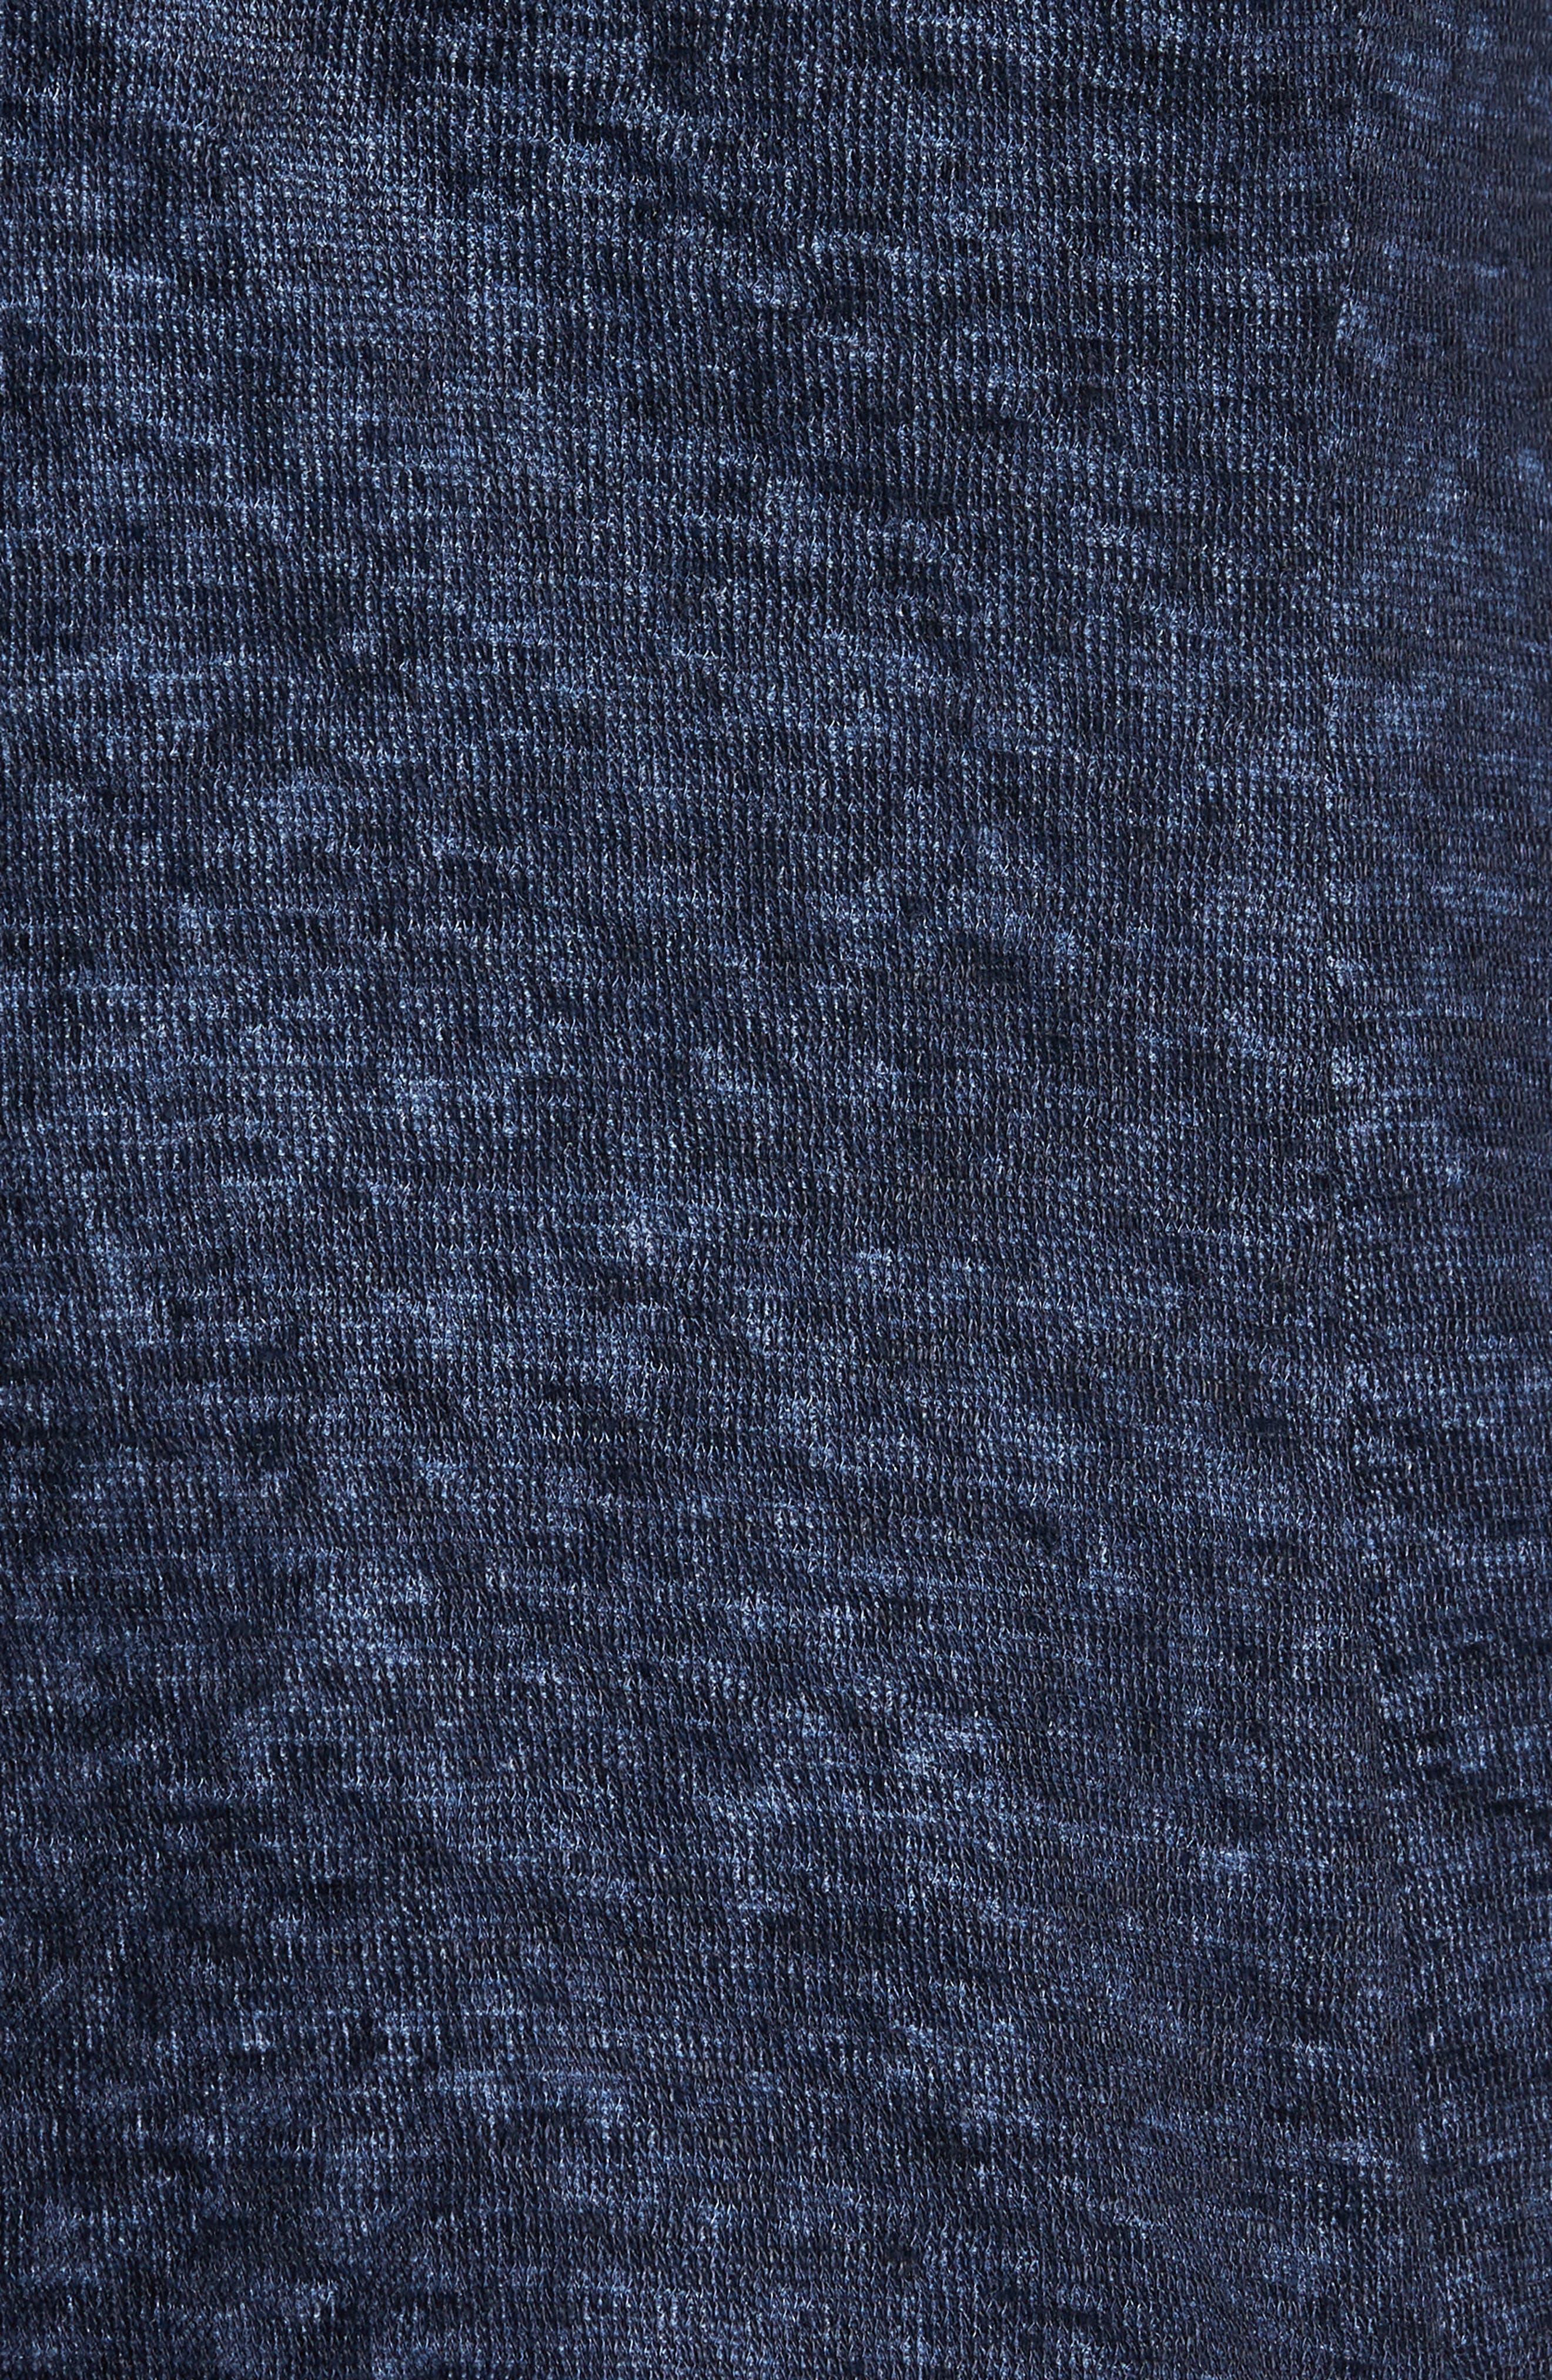 Regular Fit Cotton & Linen Blazer,                             Alternate thumbnail 6, color,                             406